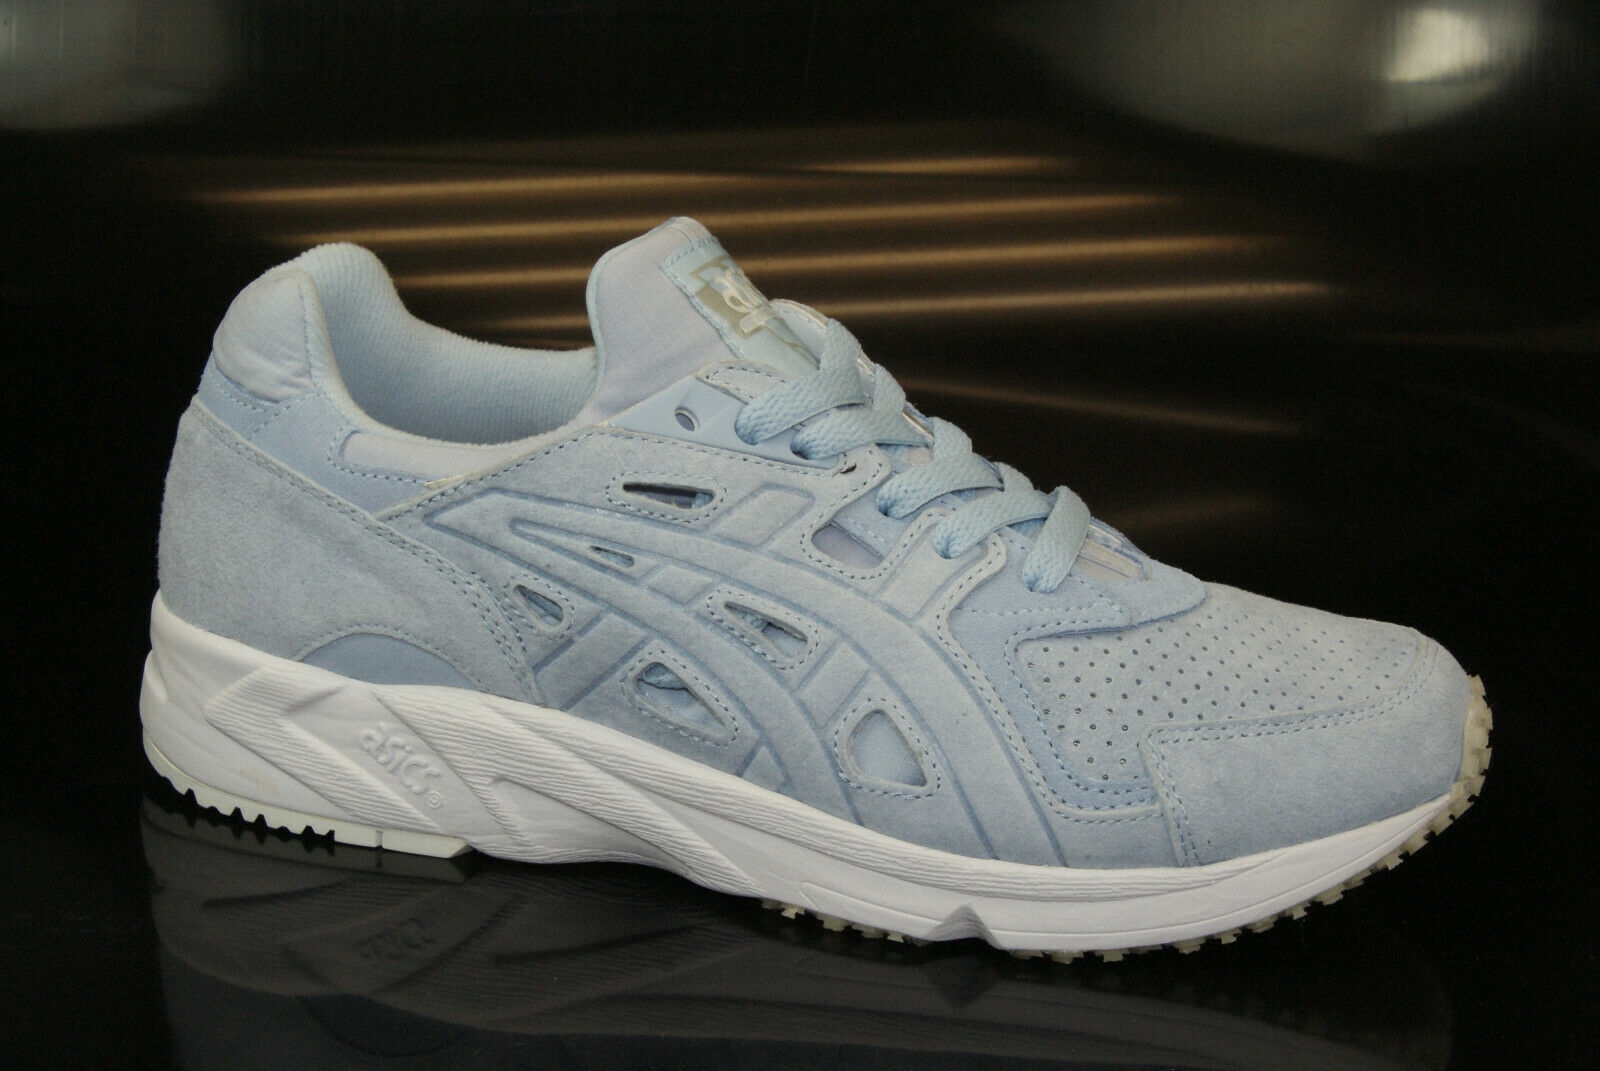 Asics Gel-Ds Trainer Size 41,5 Us 8 Sneakers shoes Men's Women's Hl7x4-3939